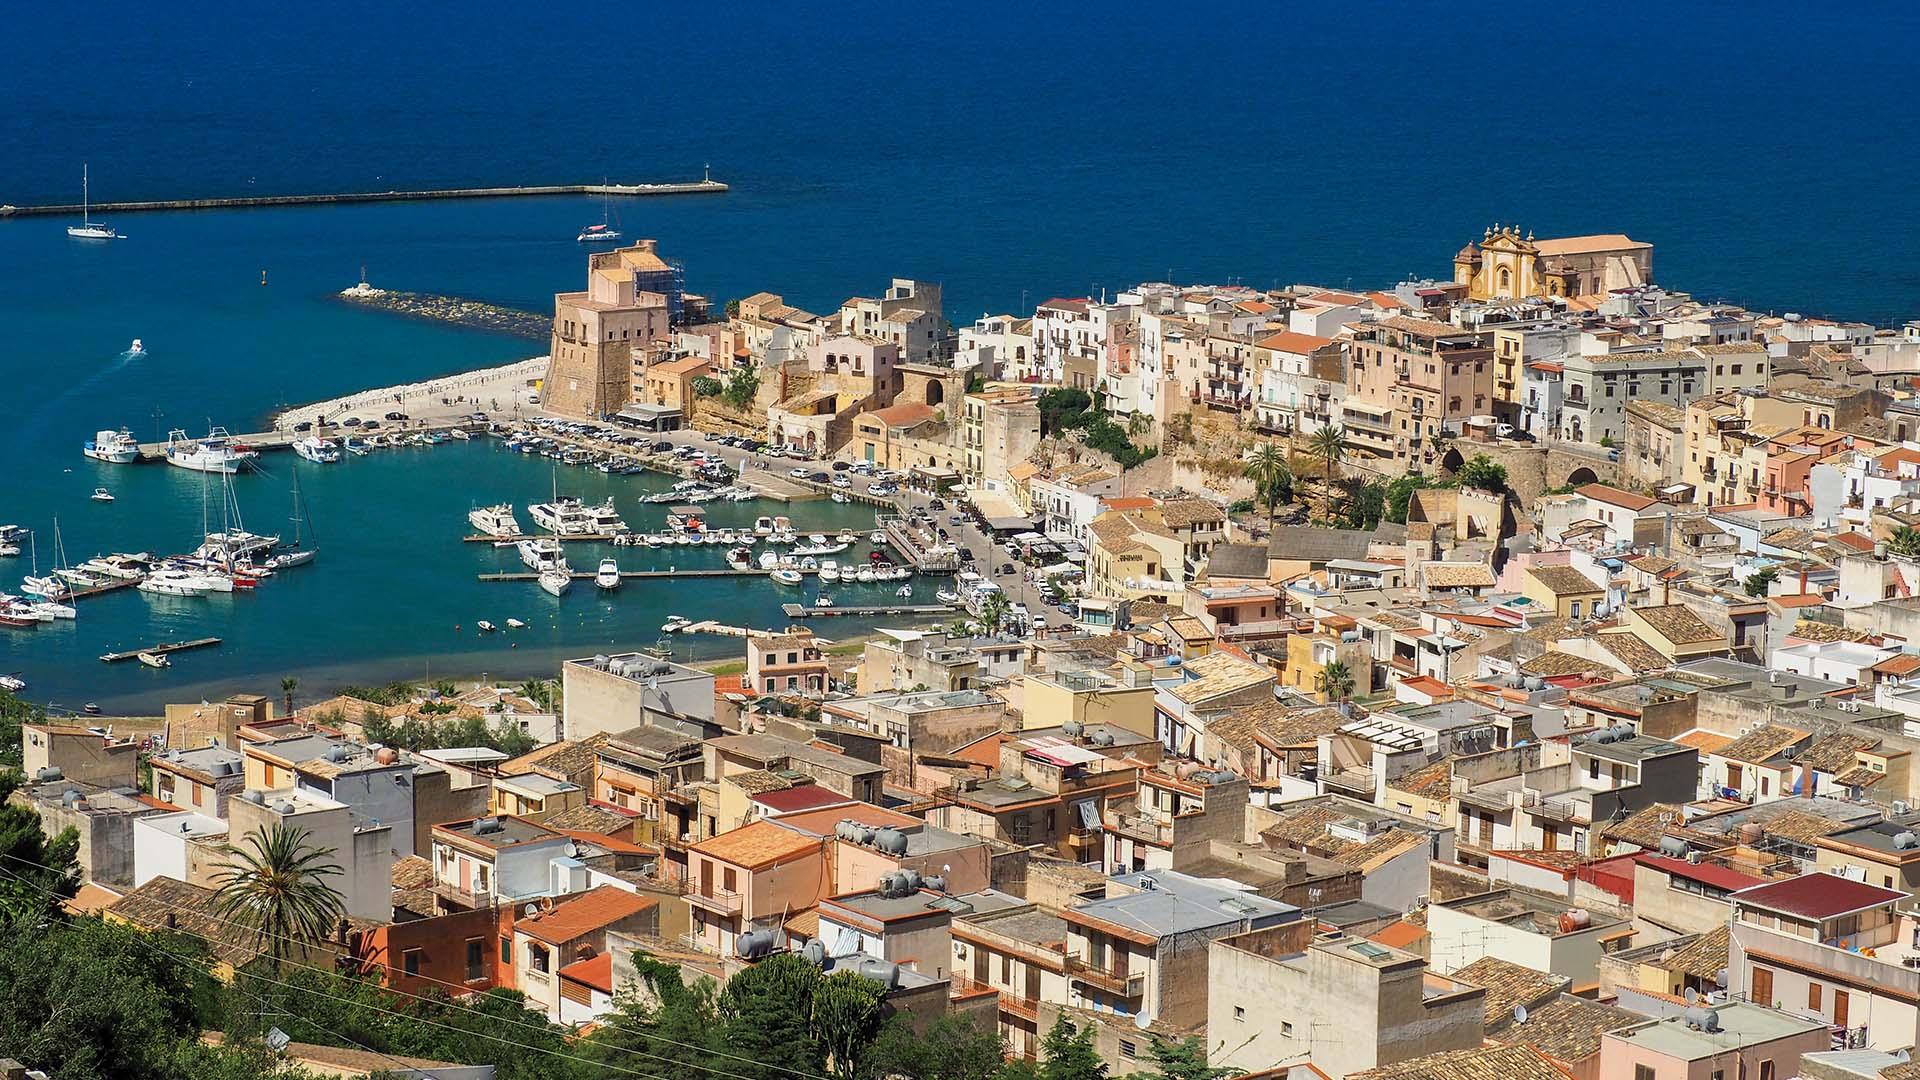 Cannoli siciliani, Tour 1 (Rundtour)